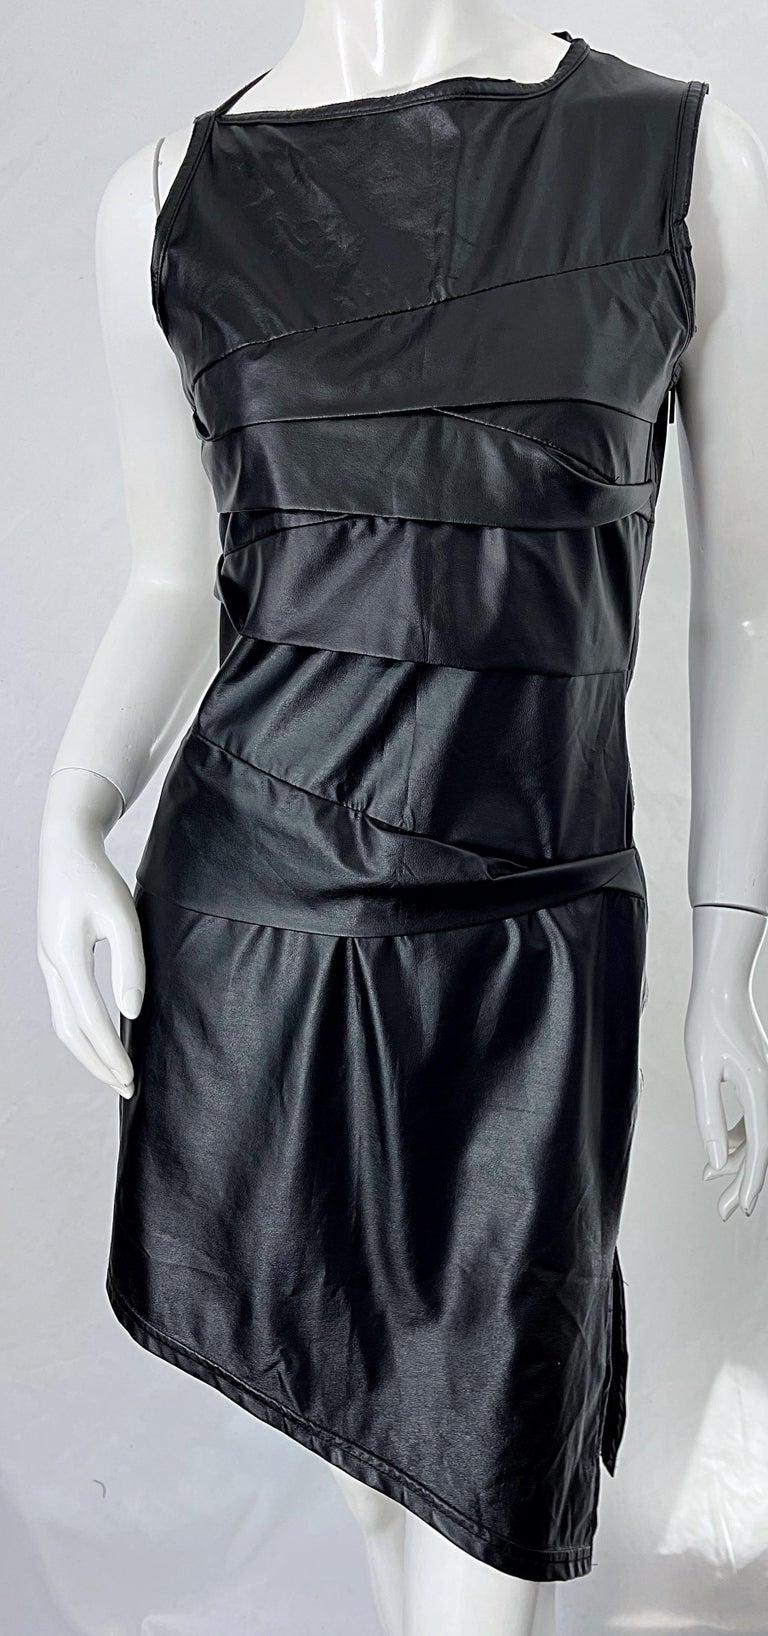 1990s Dexter Wong Club Kid Rave Japanese Black Pleather Vintage 90s Mini Dress For Sale 4